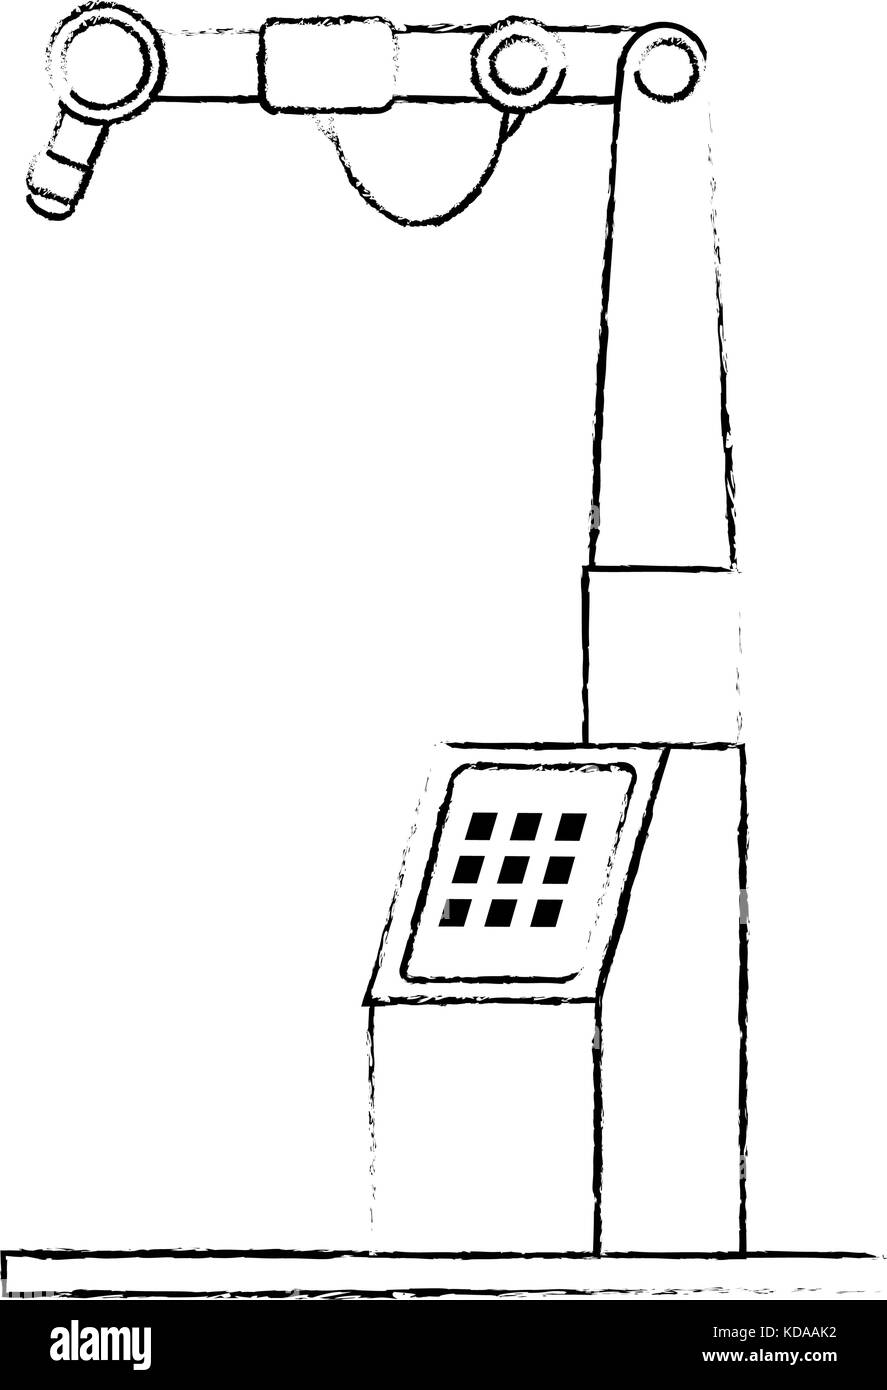 assembly machine isolated icon - Stock Image